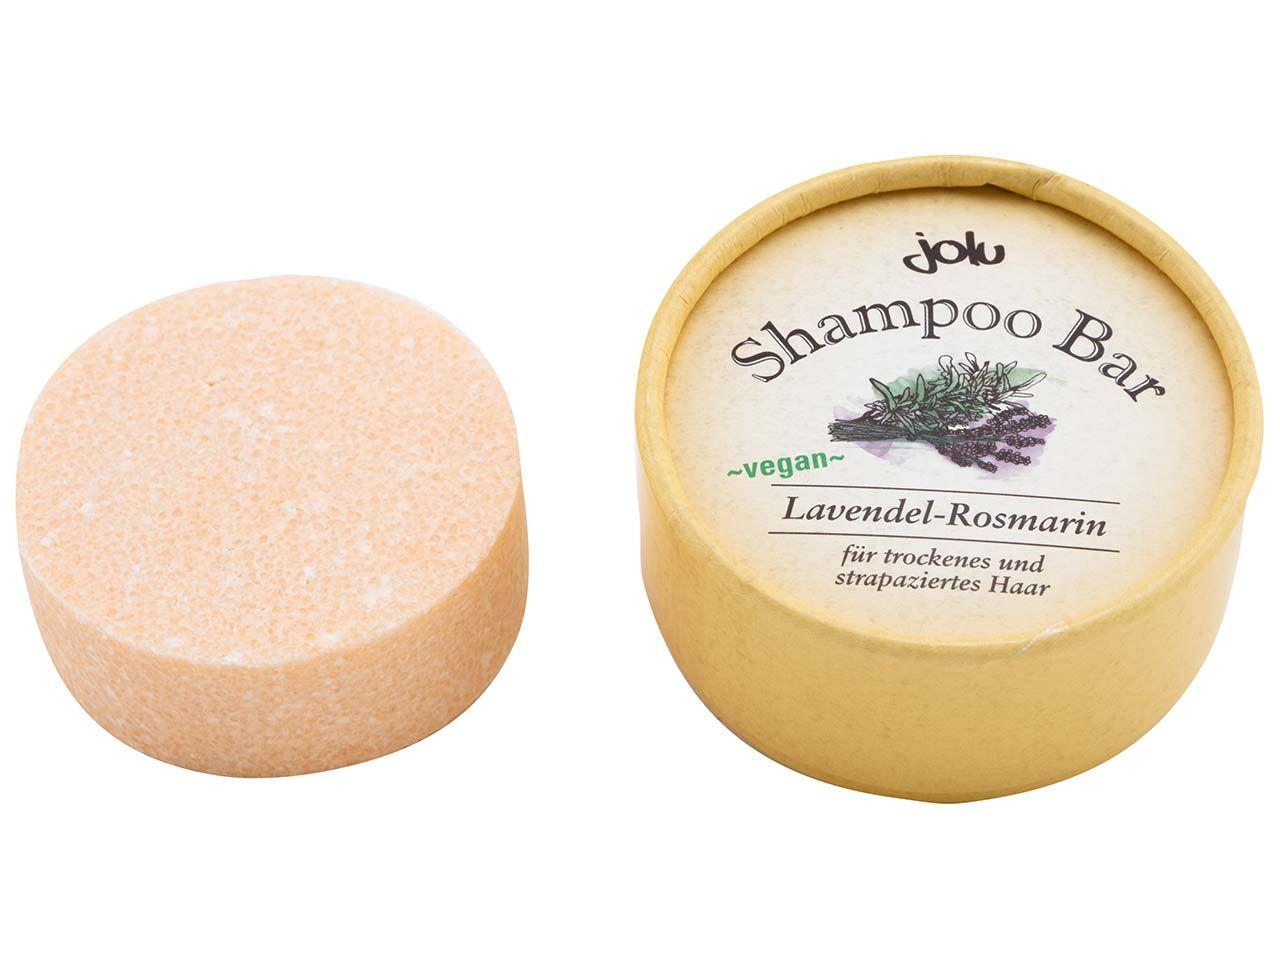 "Jolu Festes Shampoo ""Shampoo Bar Lavendel-Rosmarin"" in Pappdose, 50 g 310"